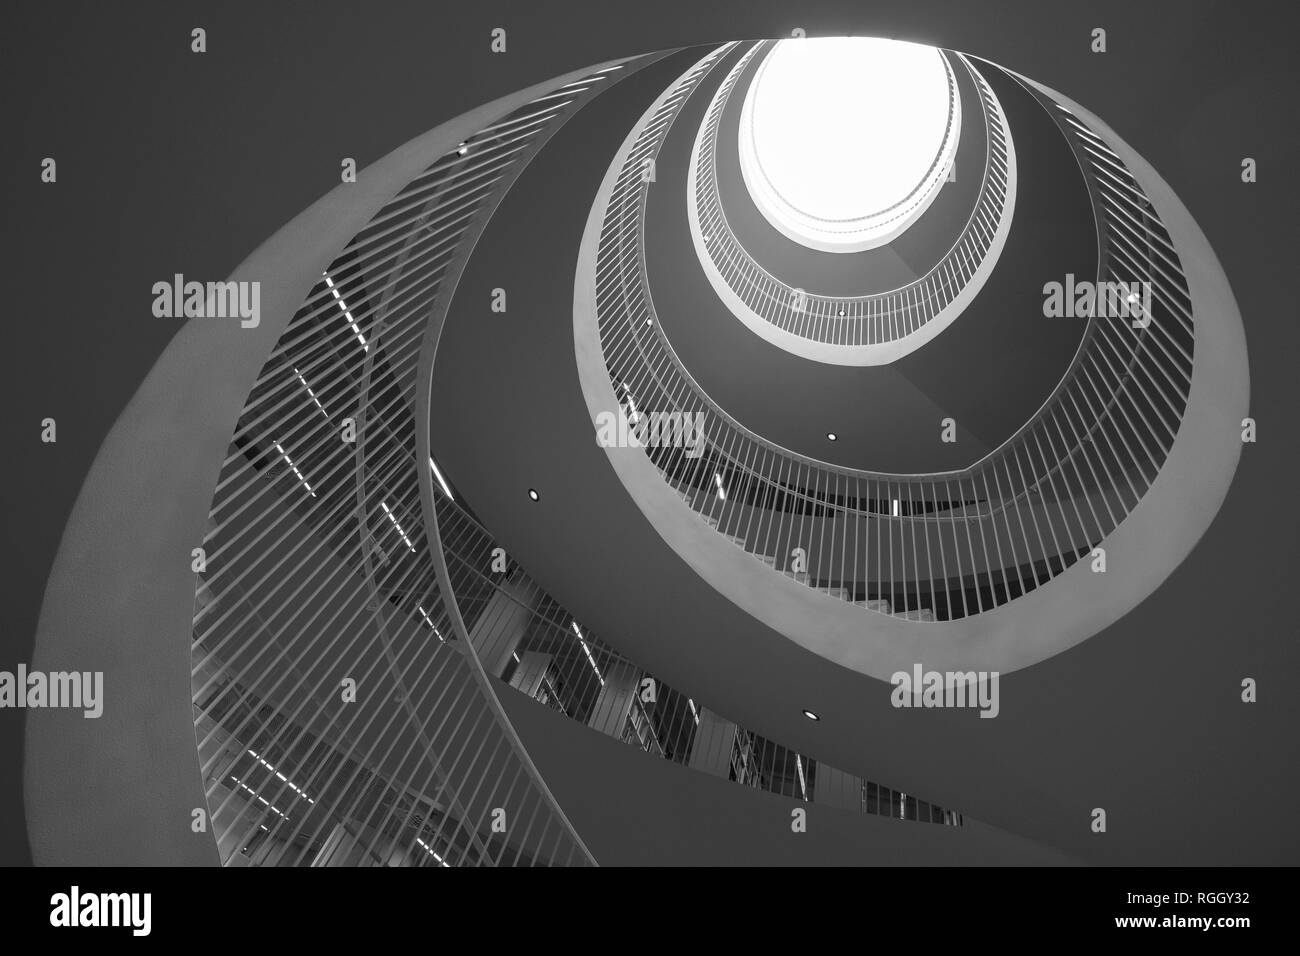 Spiral staircase from below, University Library, Helsingin yliopiston kirjasto, Interior, Helsinki, Finland - Stock Image